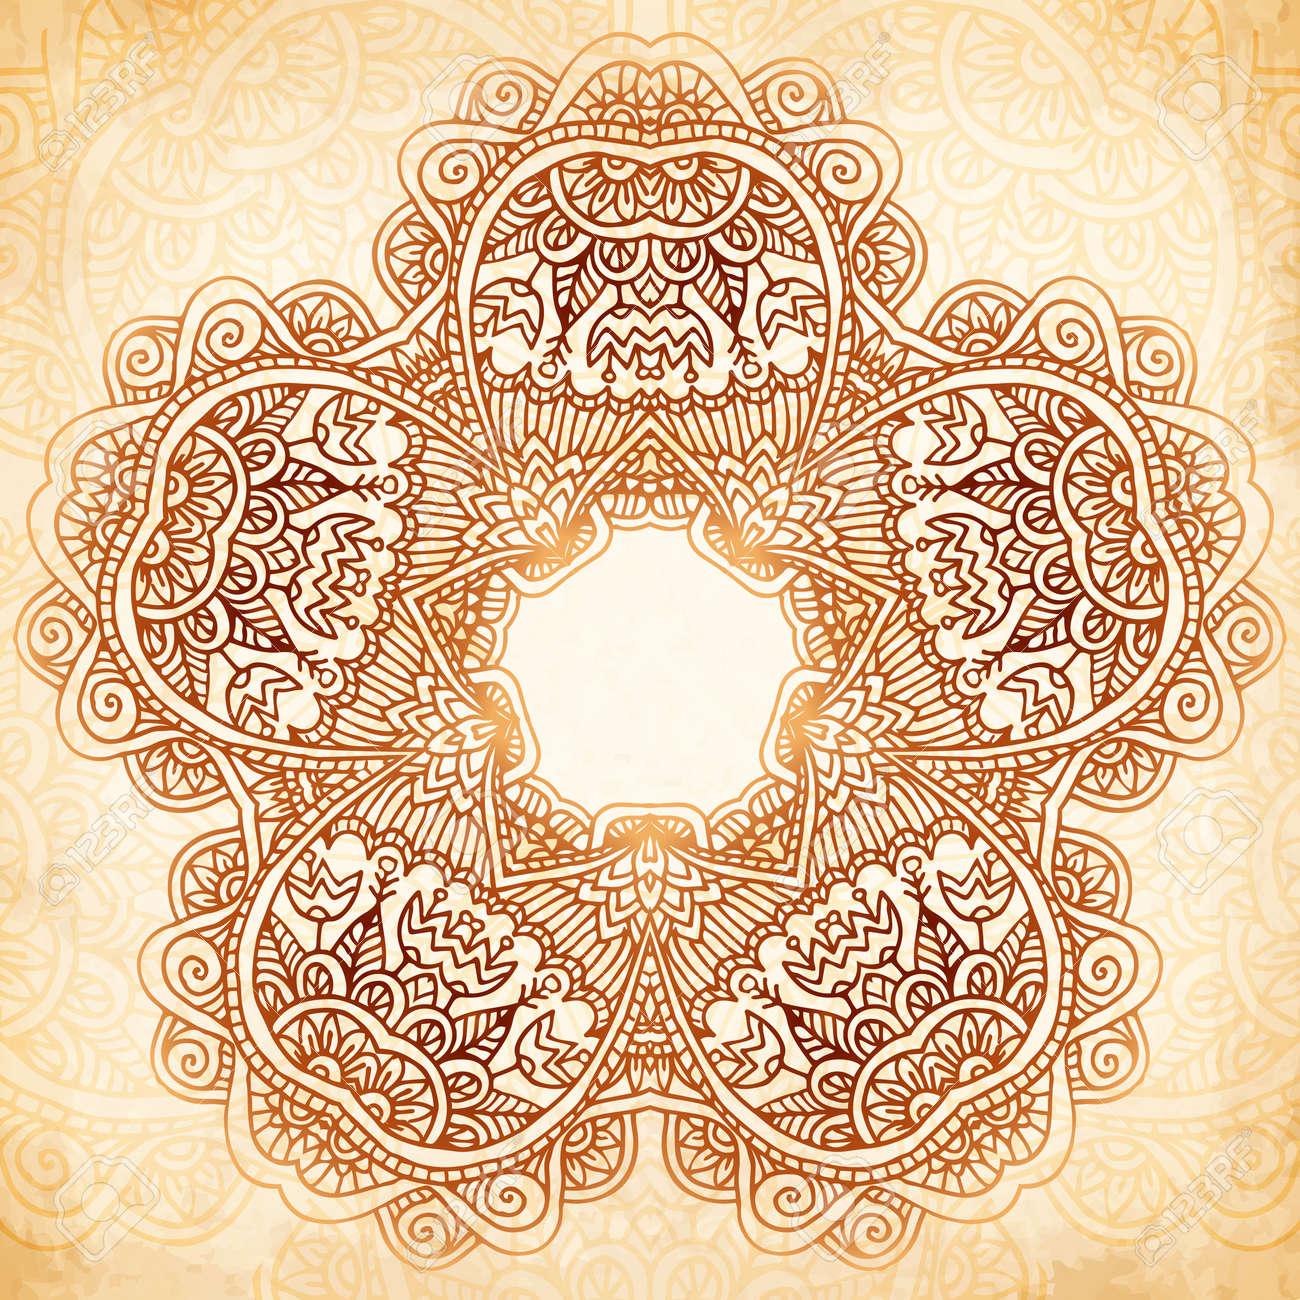 Ornate vintage vector background in mehndi style royalty free stock - Ornate Vintage Beige Vector Background In Mehndi Style Stock Vector 25747805